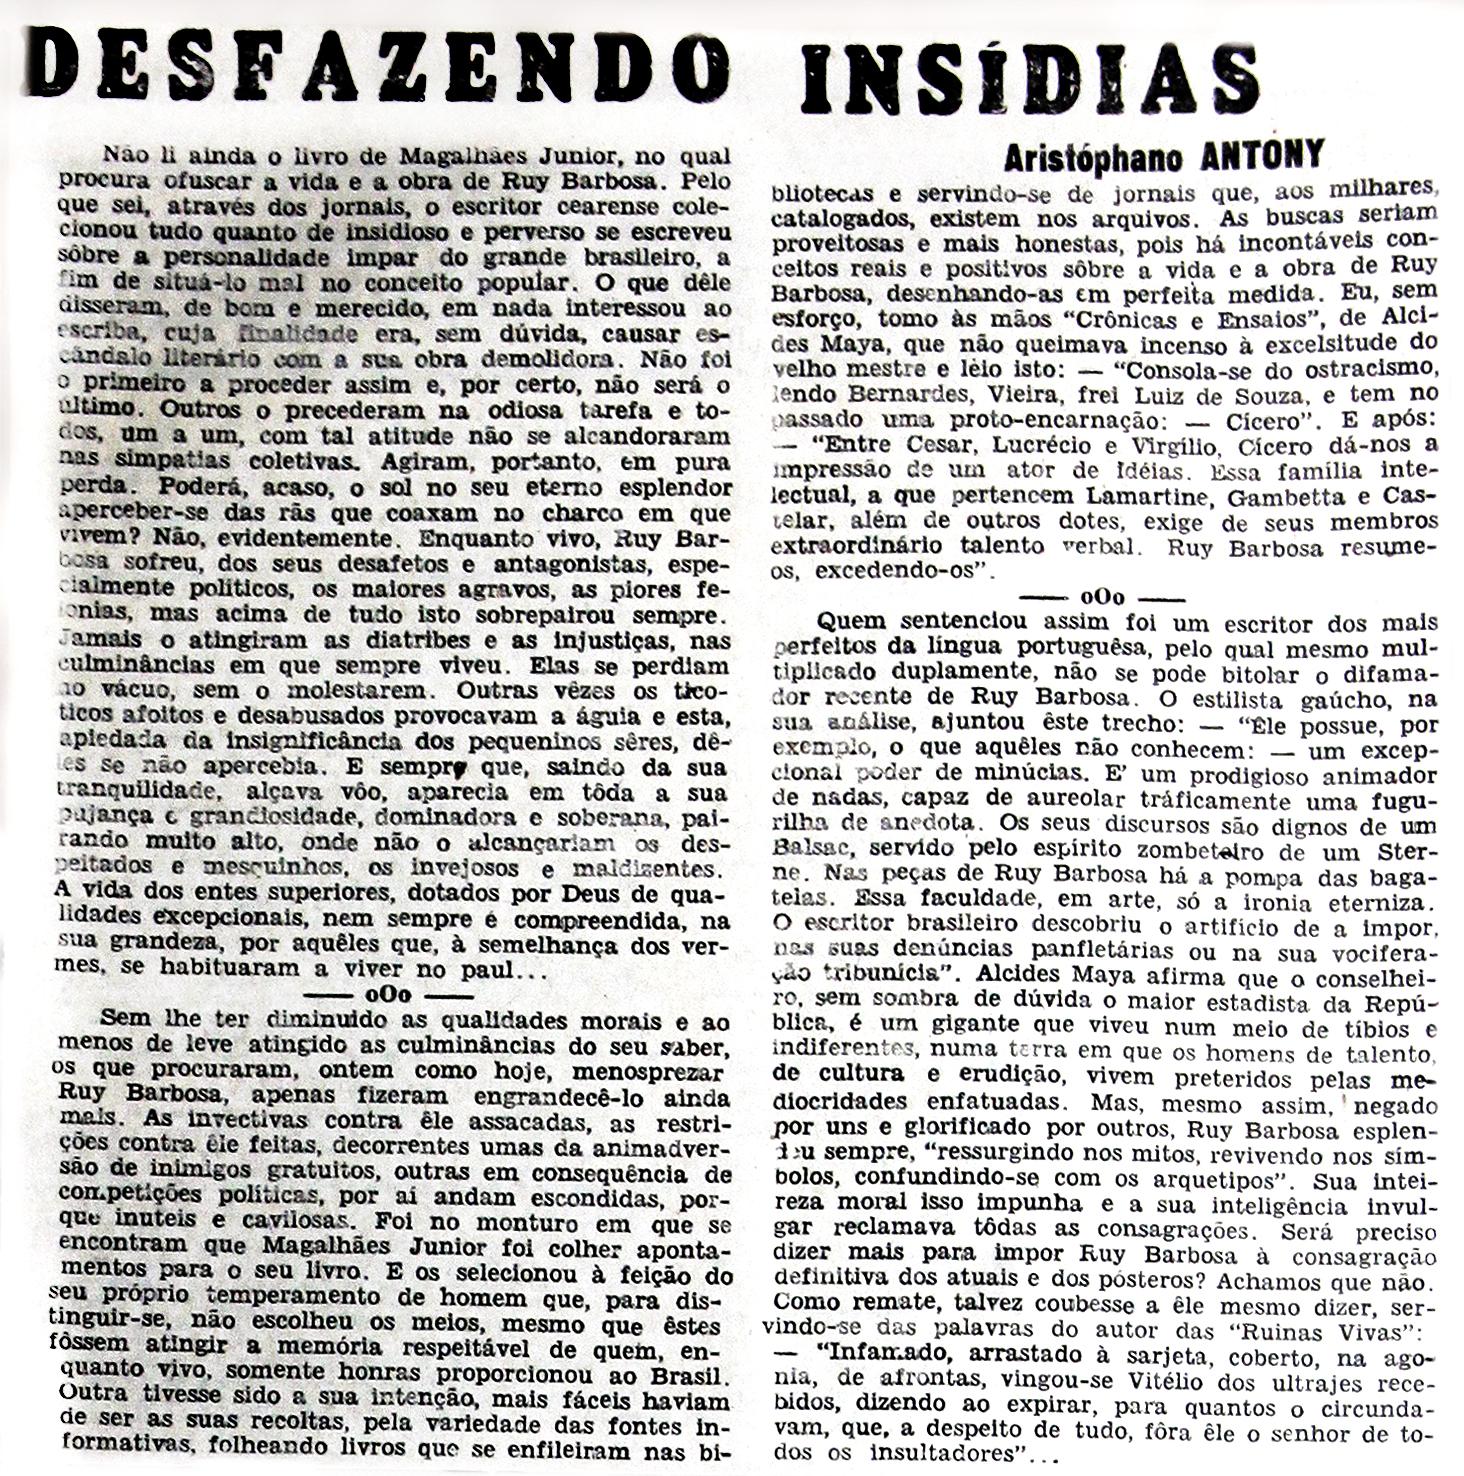 Magalhães Júnior Procura Ofuscar a Vida e Obra de Ruy Barbosa